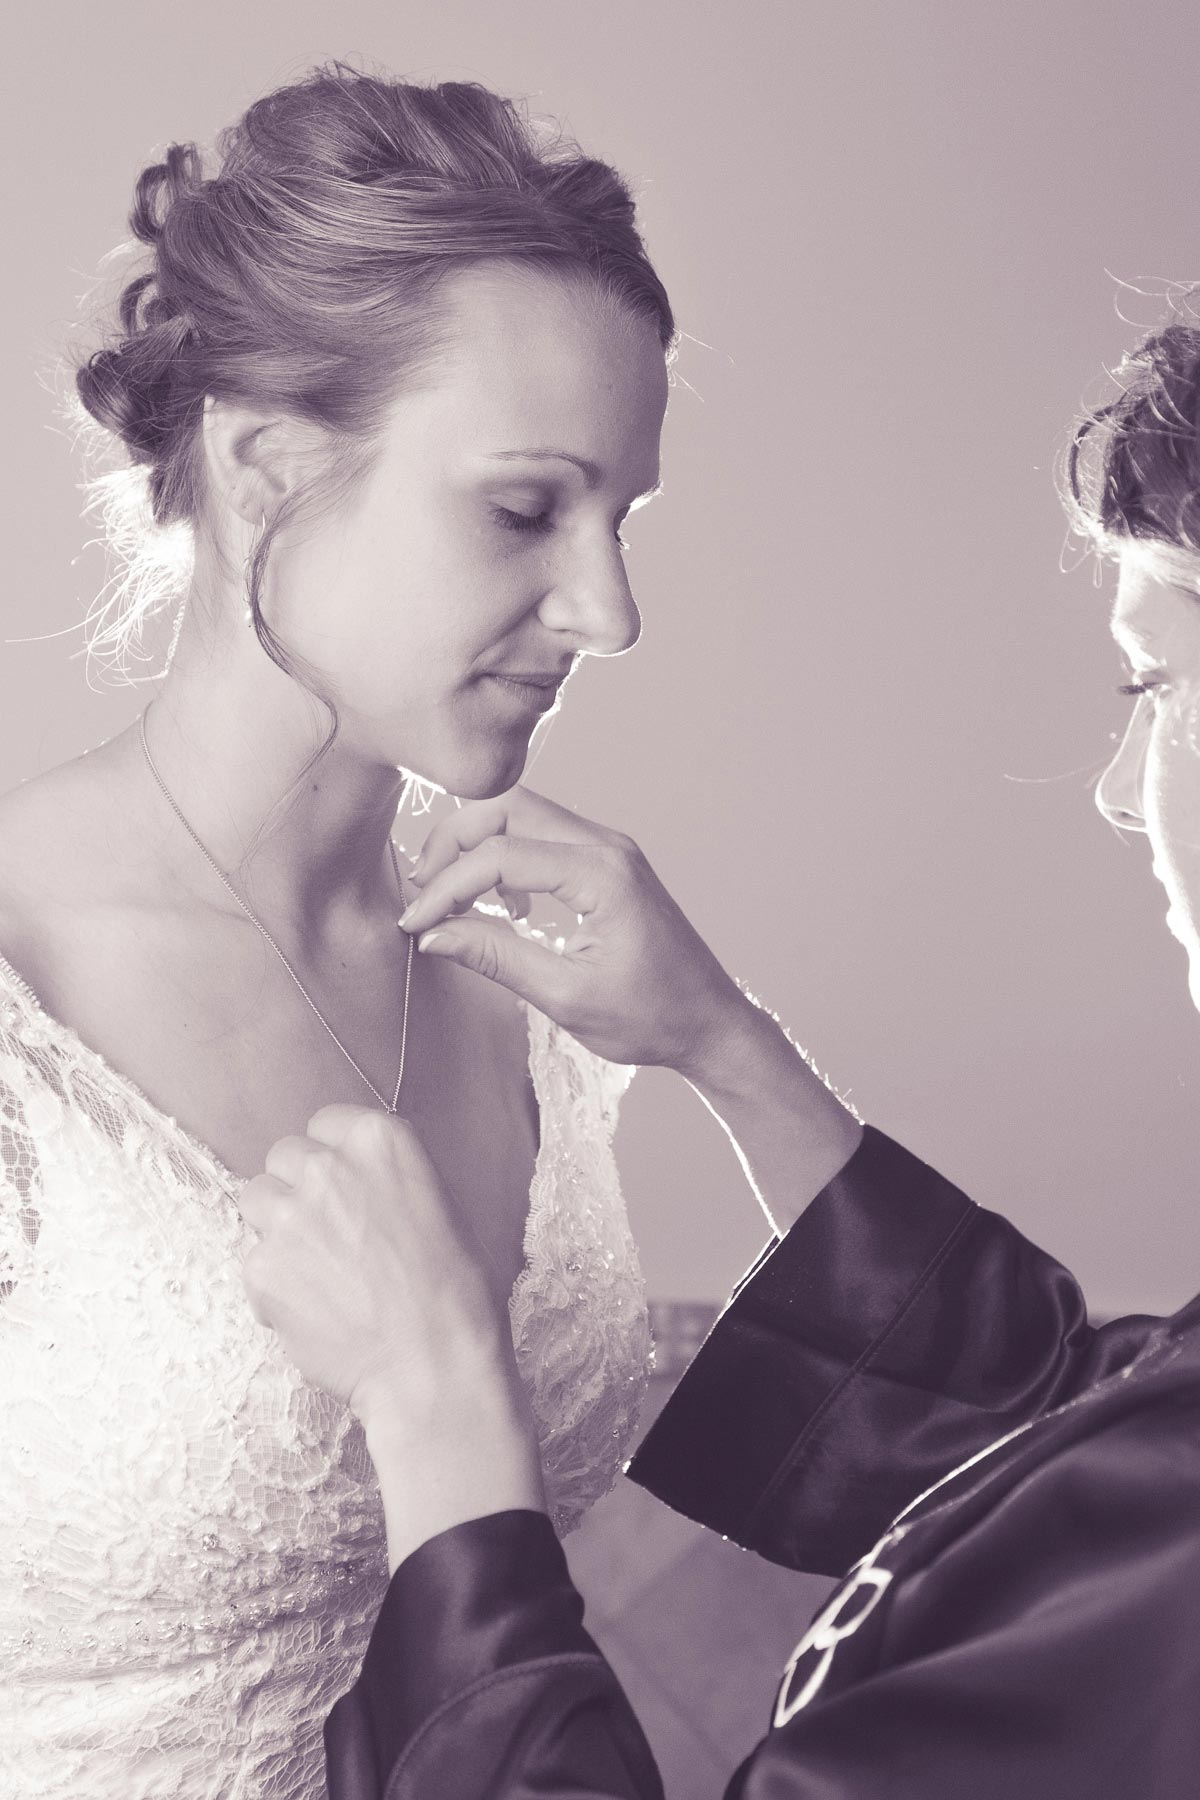 evansville-wedding-photographer-pabst-photo-kokies-echo-valley-(35)